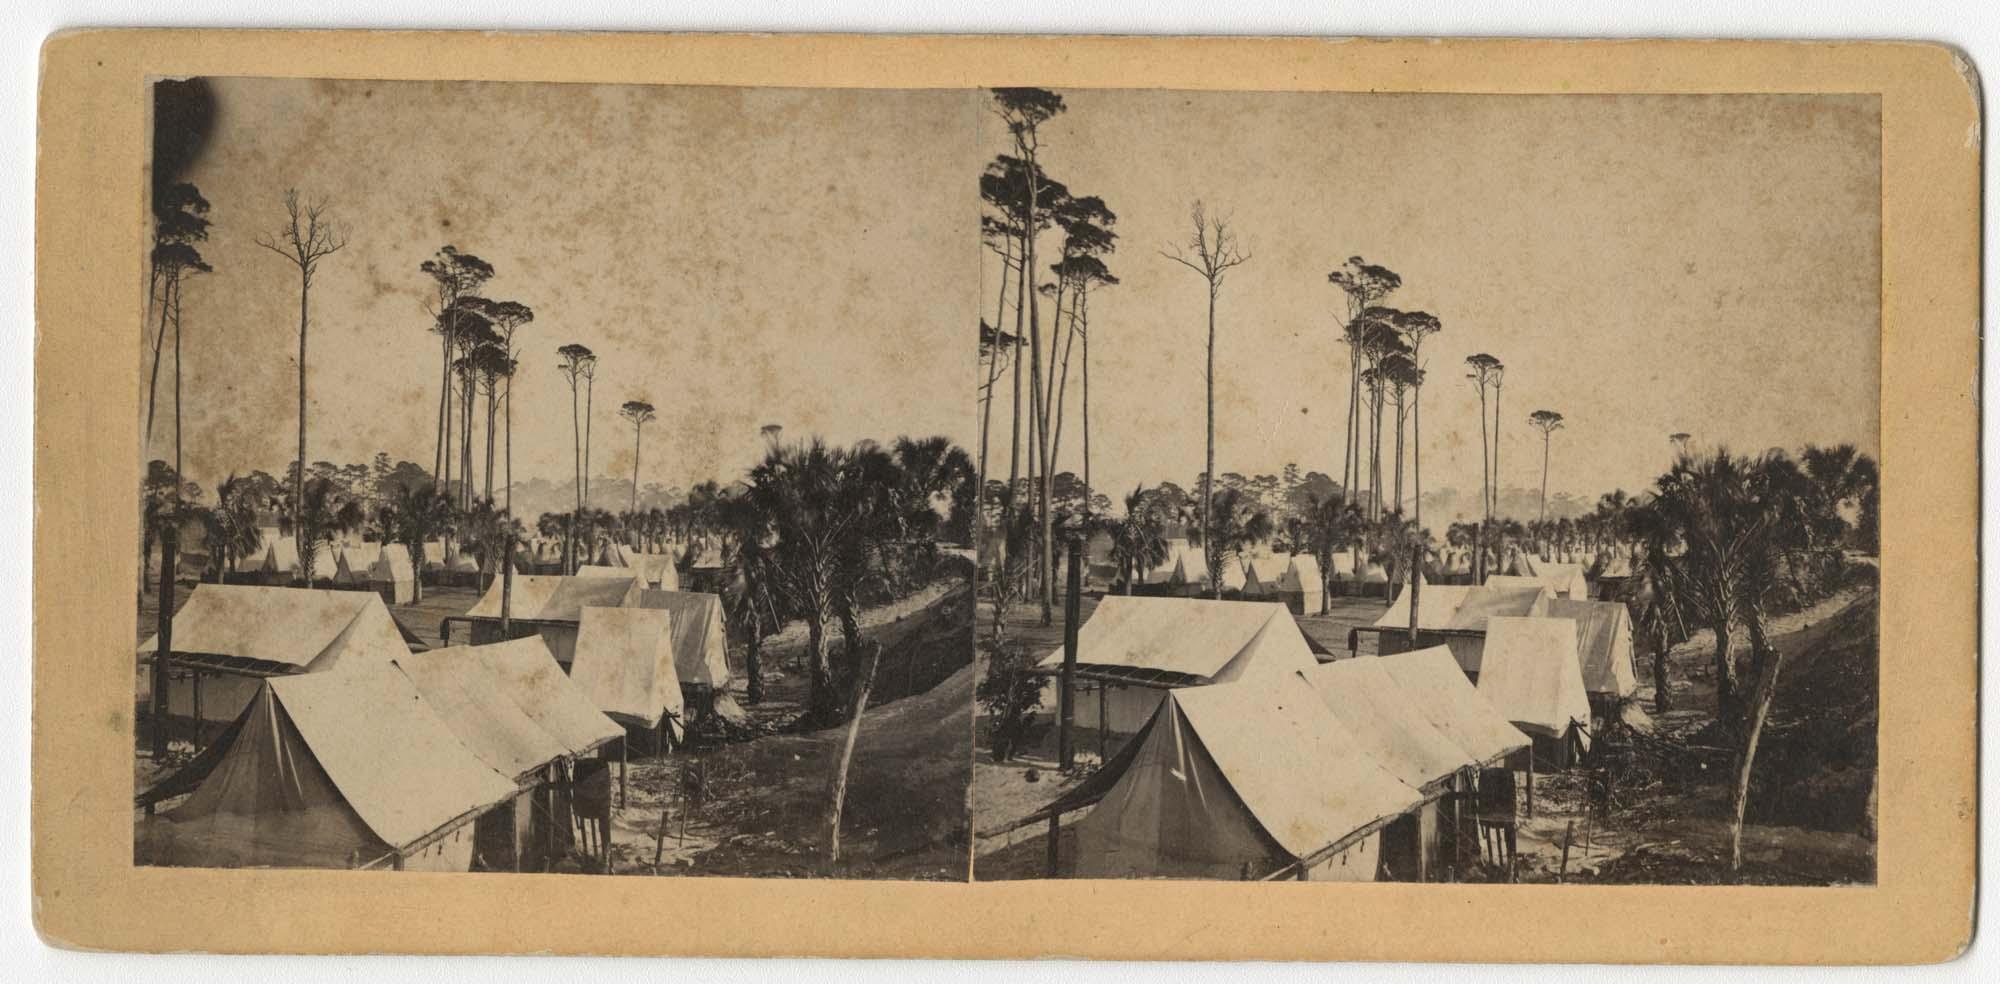 Camp of Folly Island